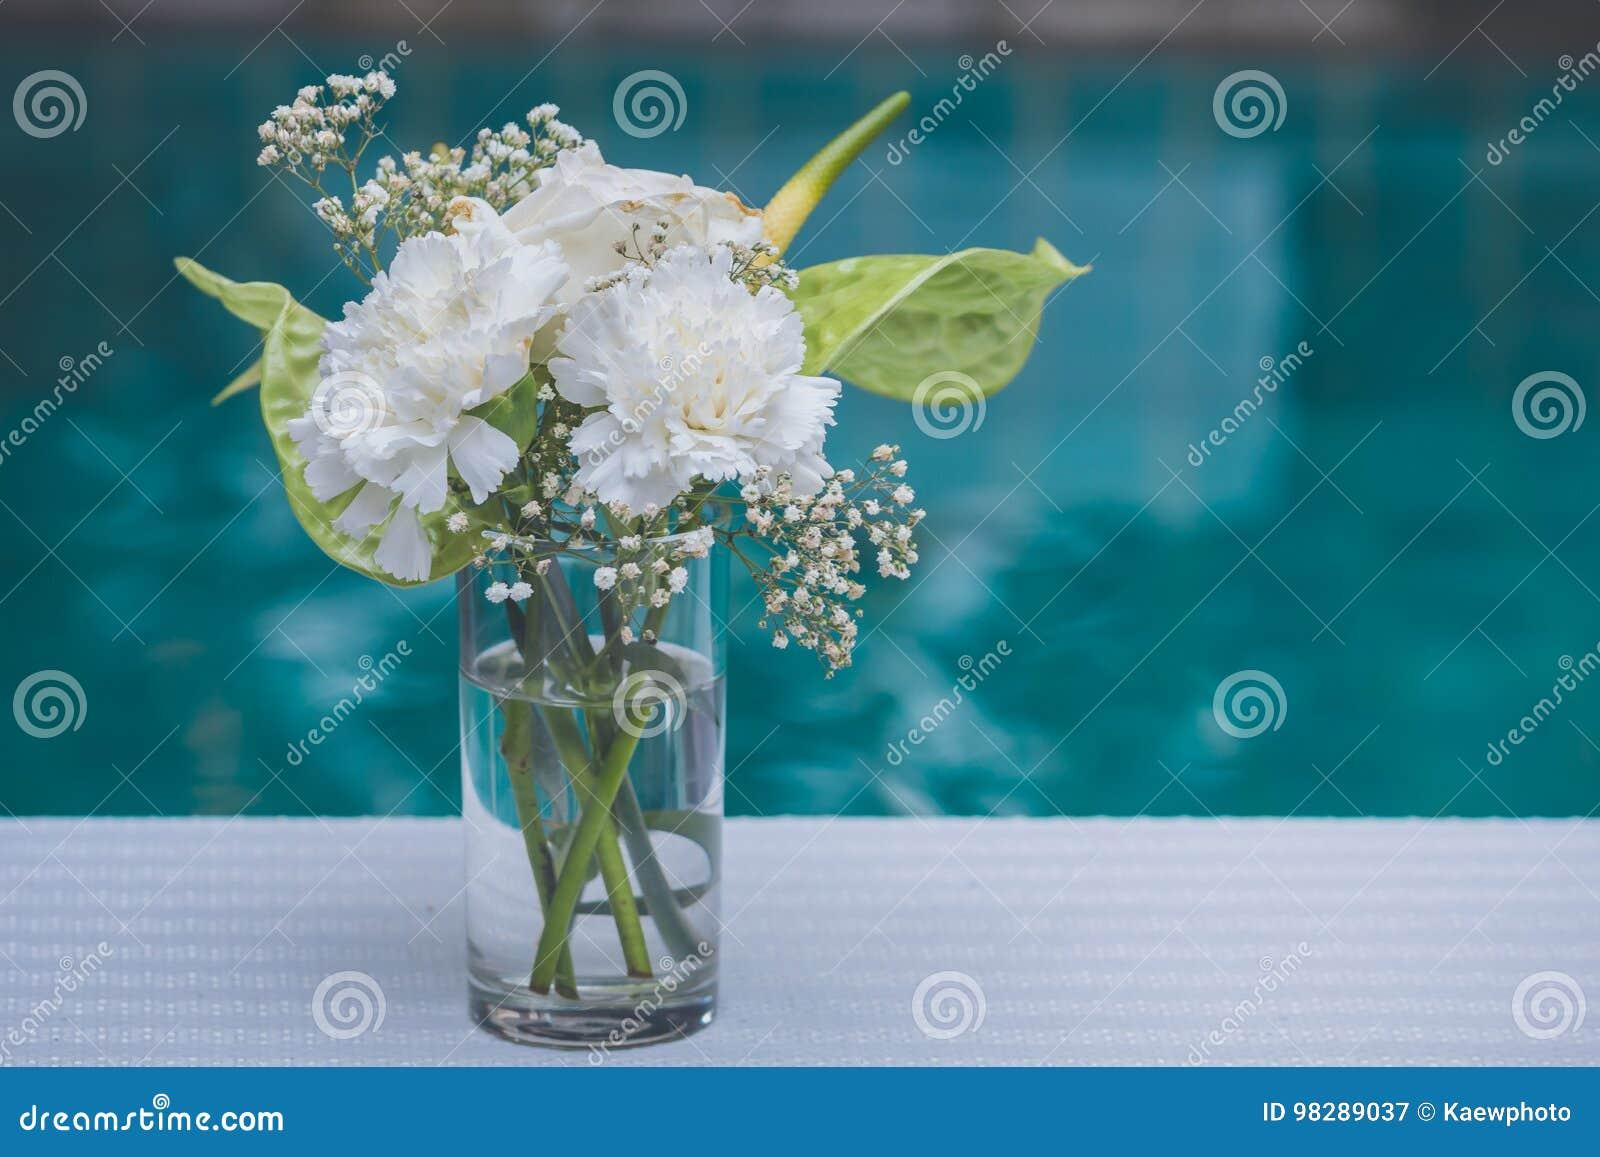 f637f7d4b2f0 Τα άσπρα λουλούδια στα βάζα διακοσμούν έναν πίνακα Στοκ Εικόνα ...